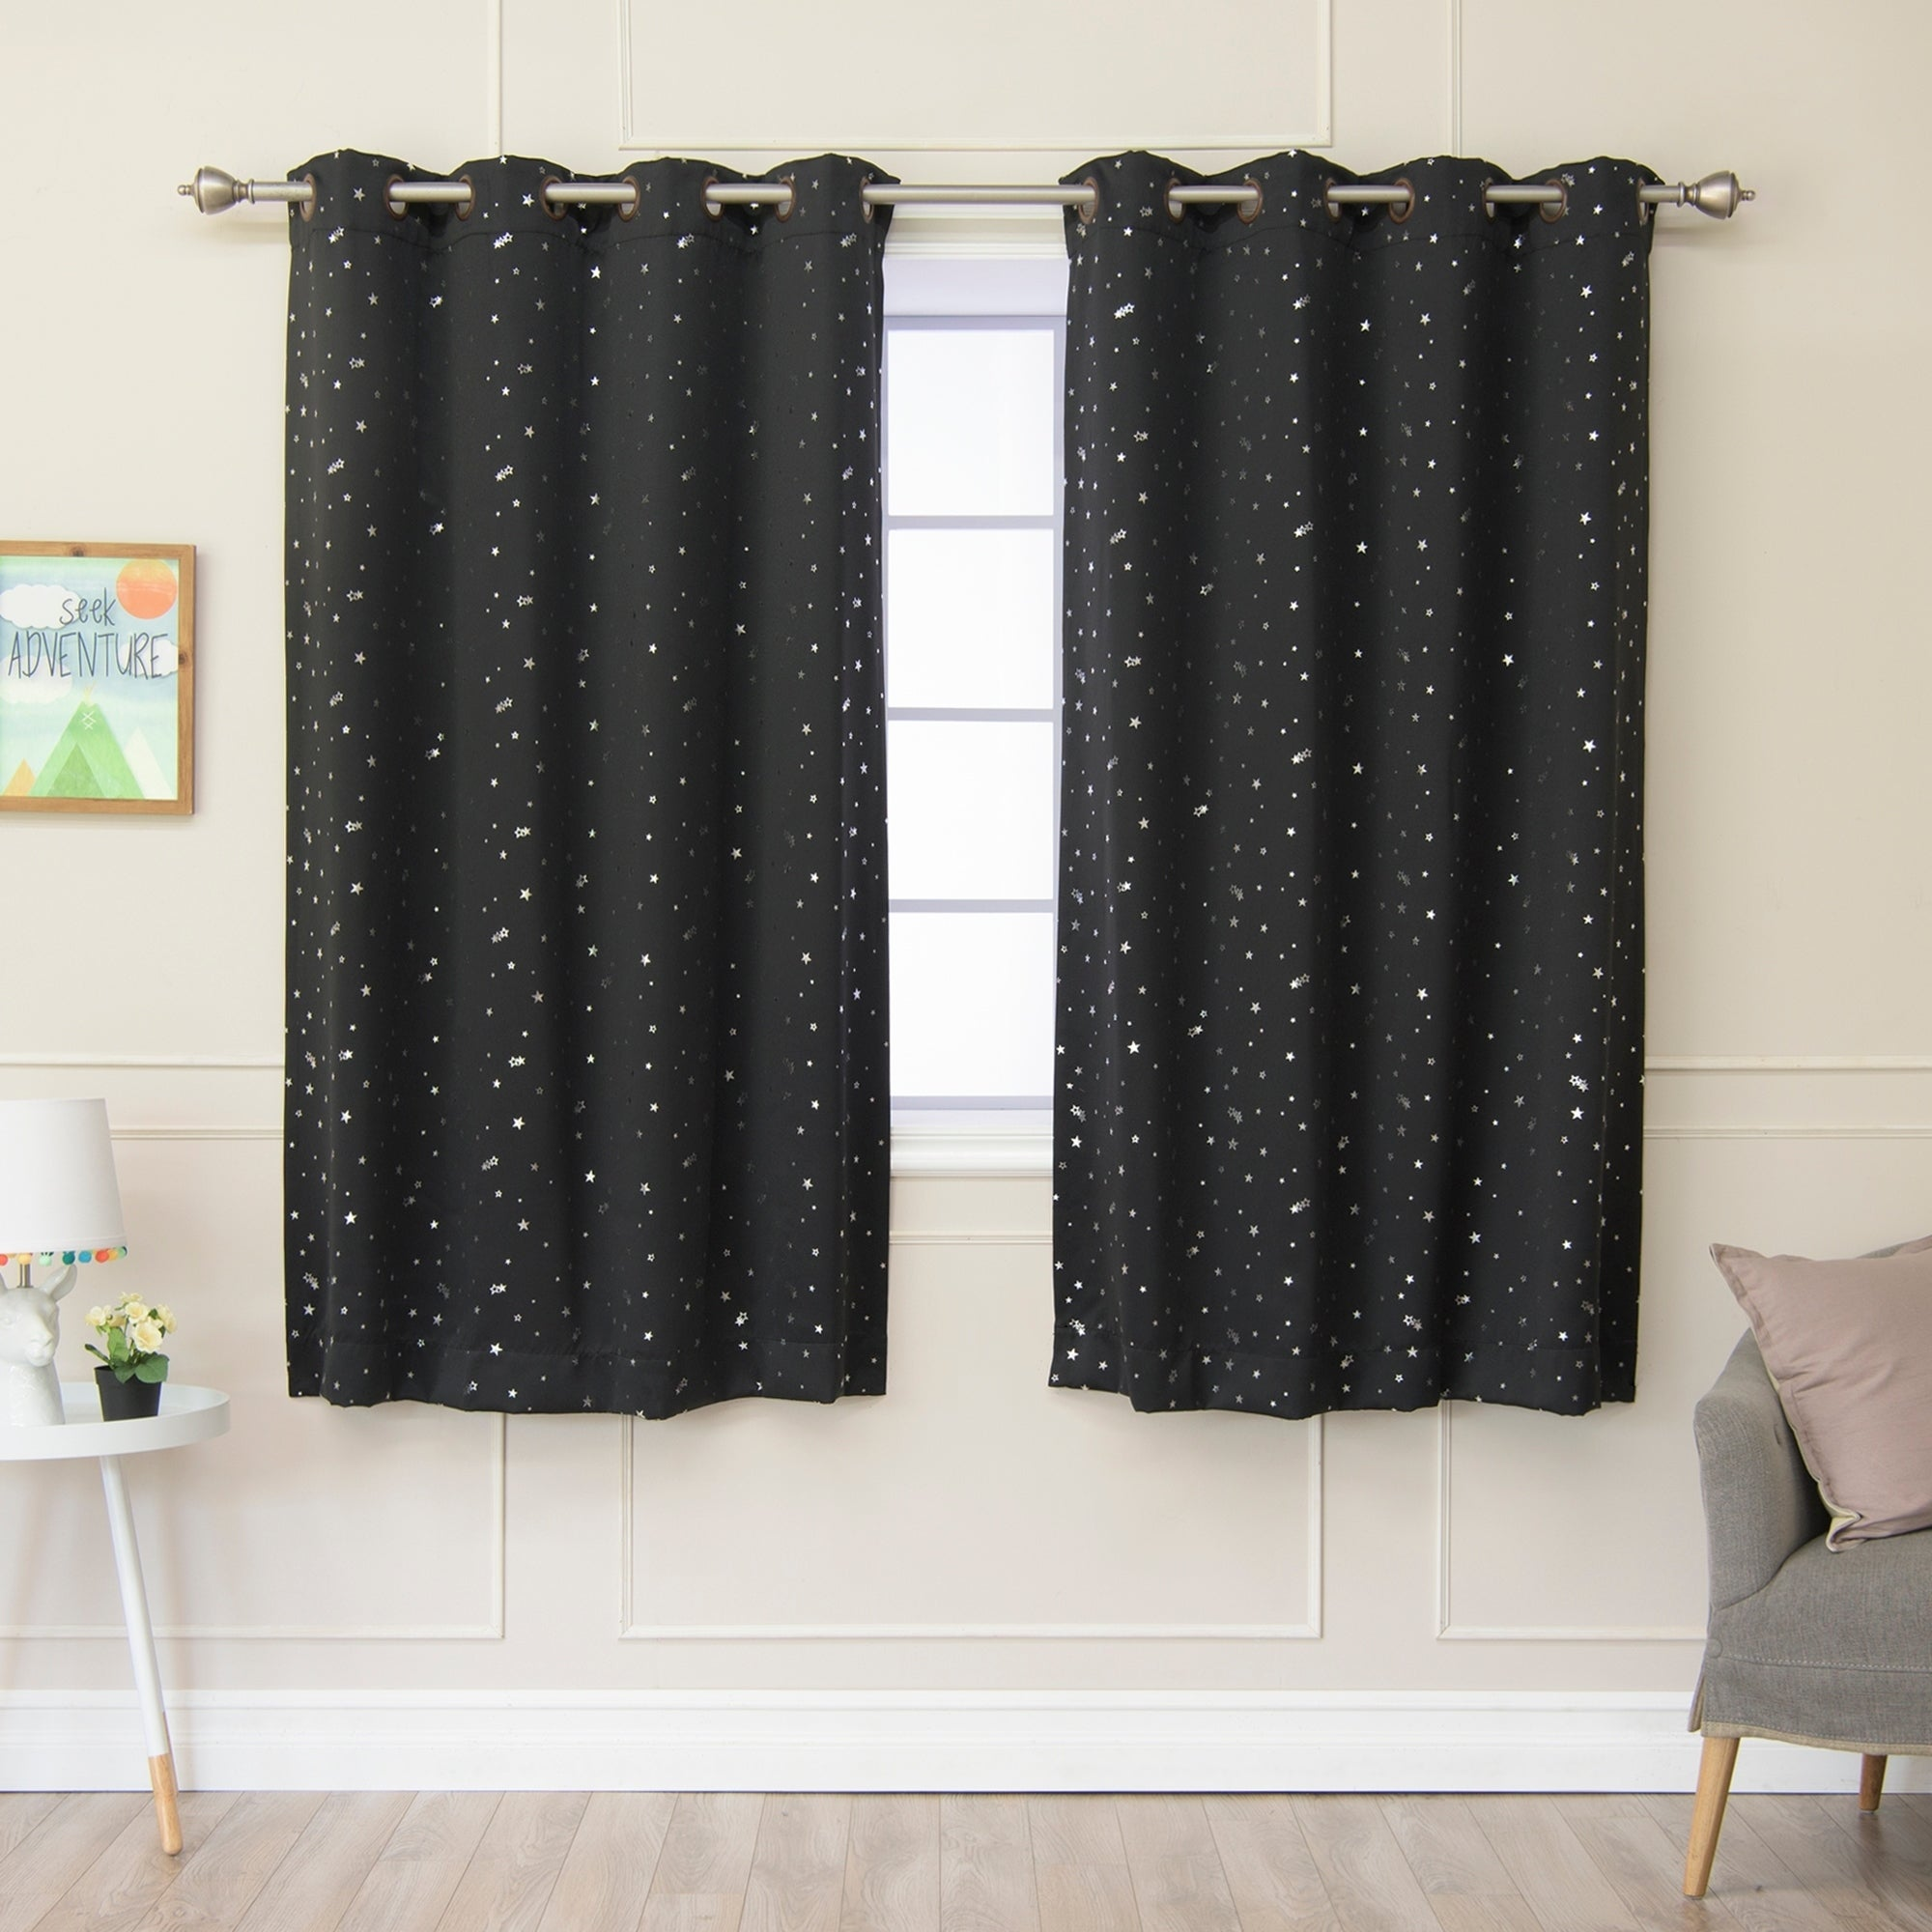 com solid mainstays curtain panels room darkening ip woven panel walmart pair curtains